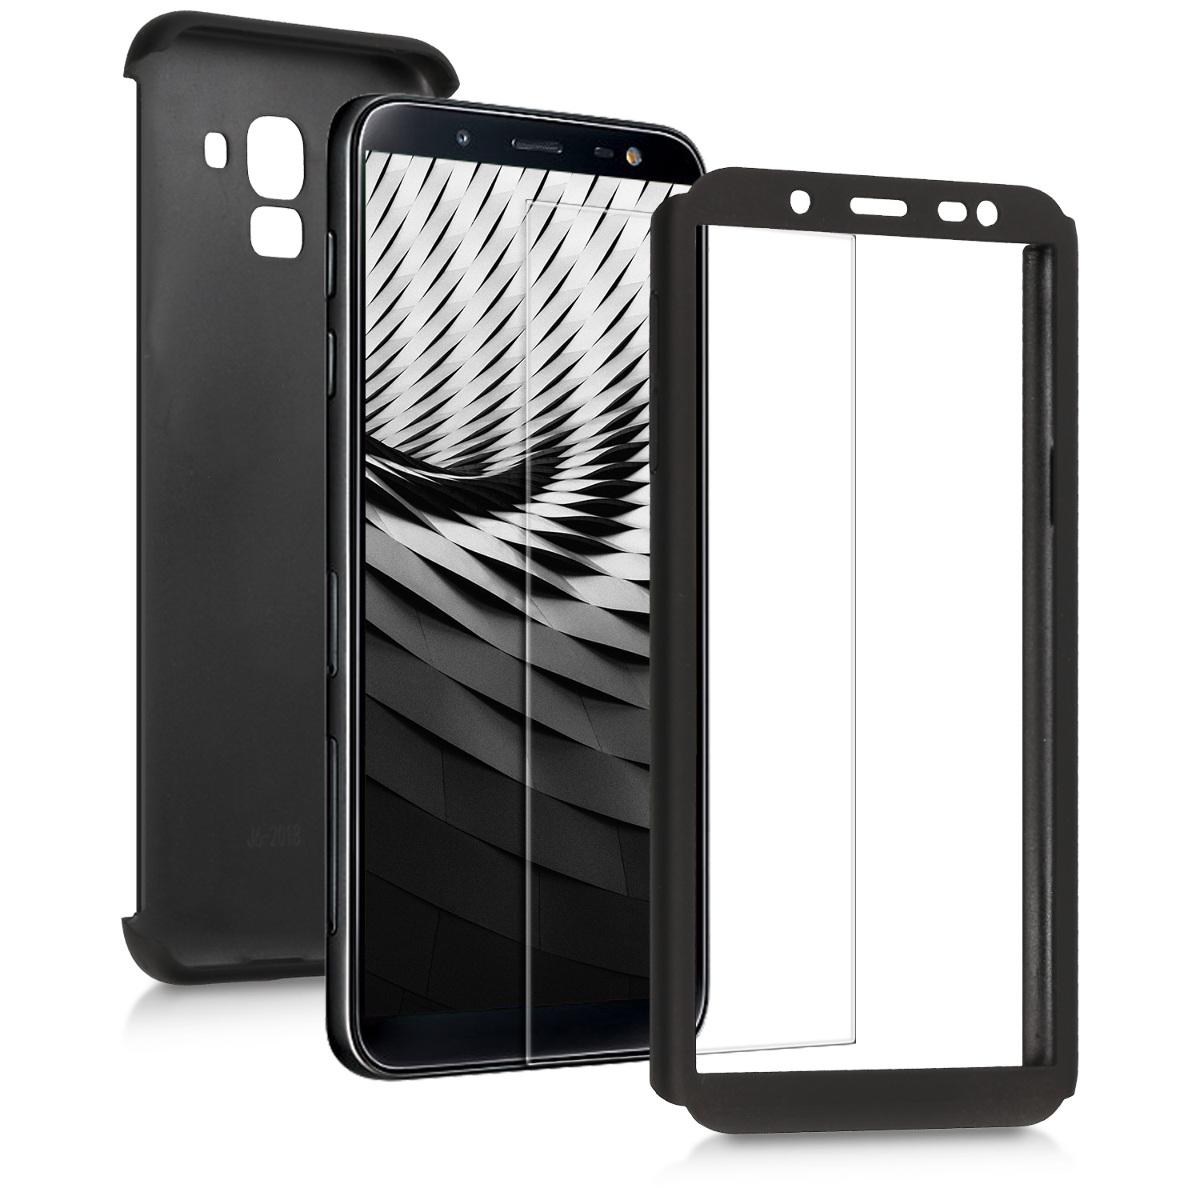 KW Θήκη Full Body  Samsung Galaxy J6 - Metallic Black (46591.68)